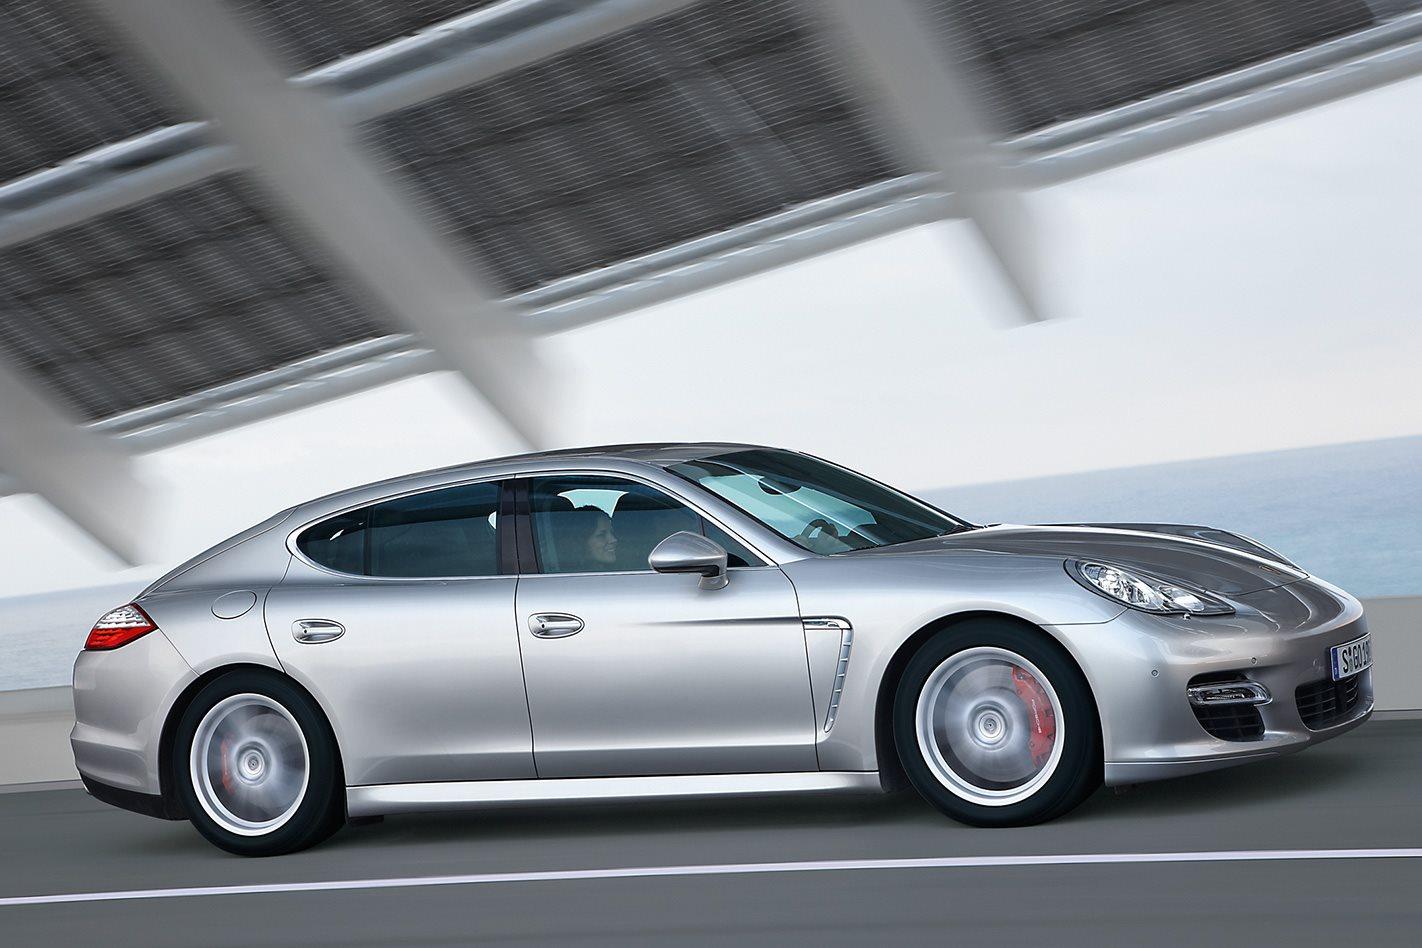 2010 Porsche Panamera Turbo driving